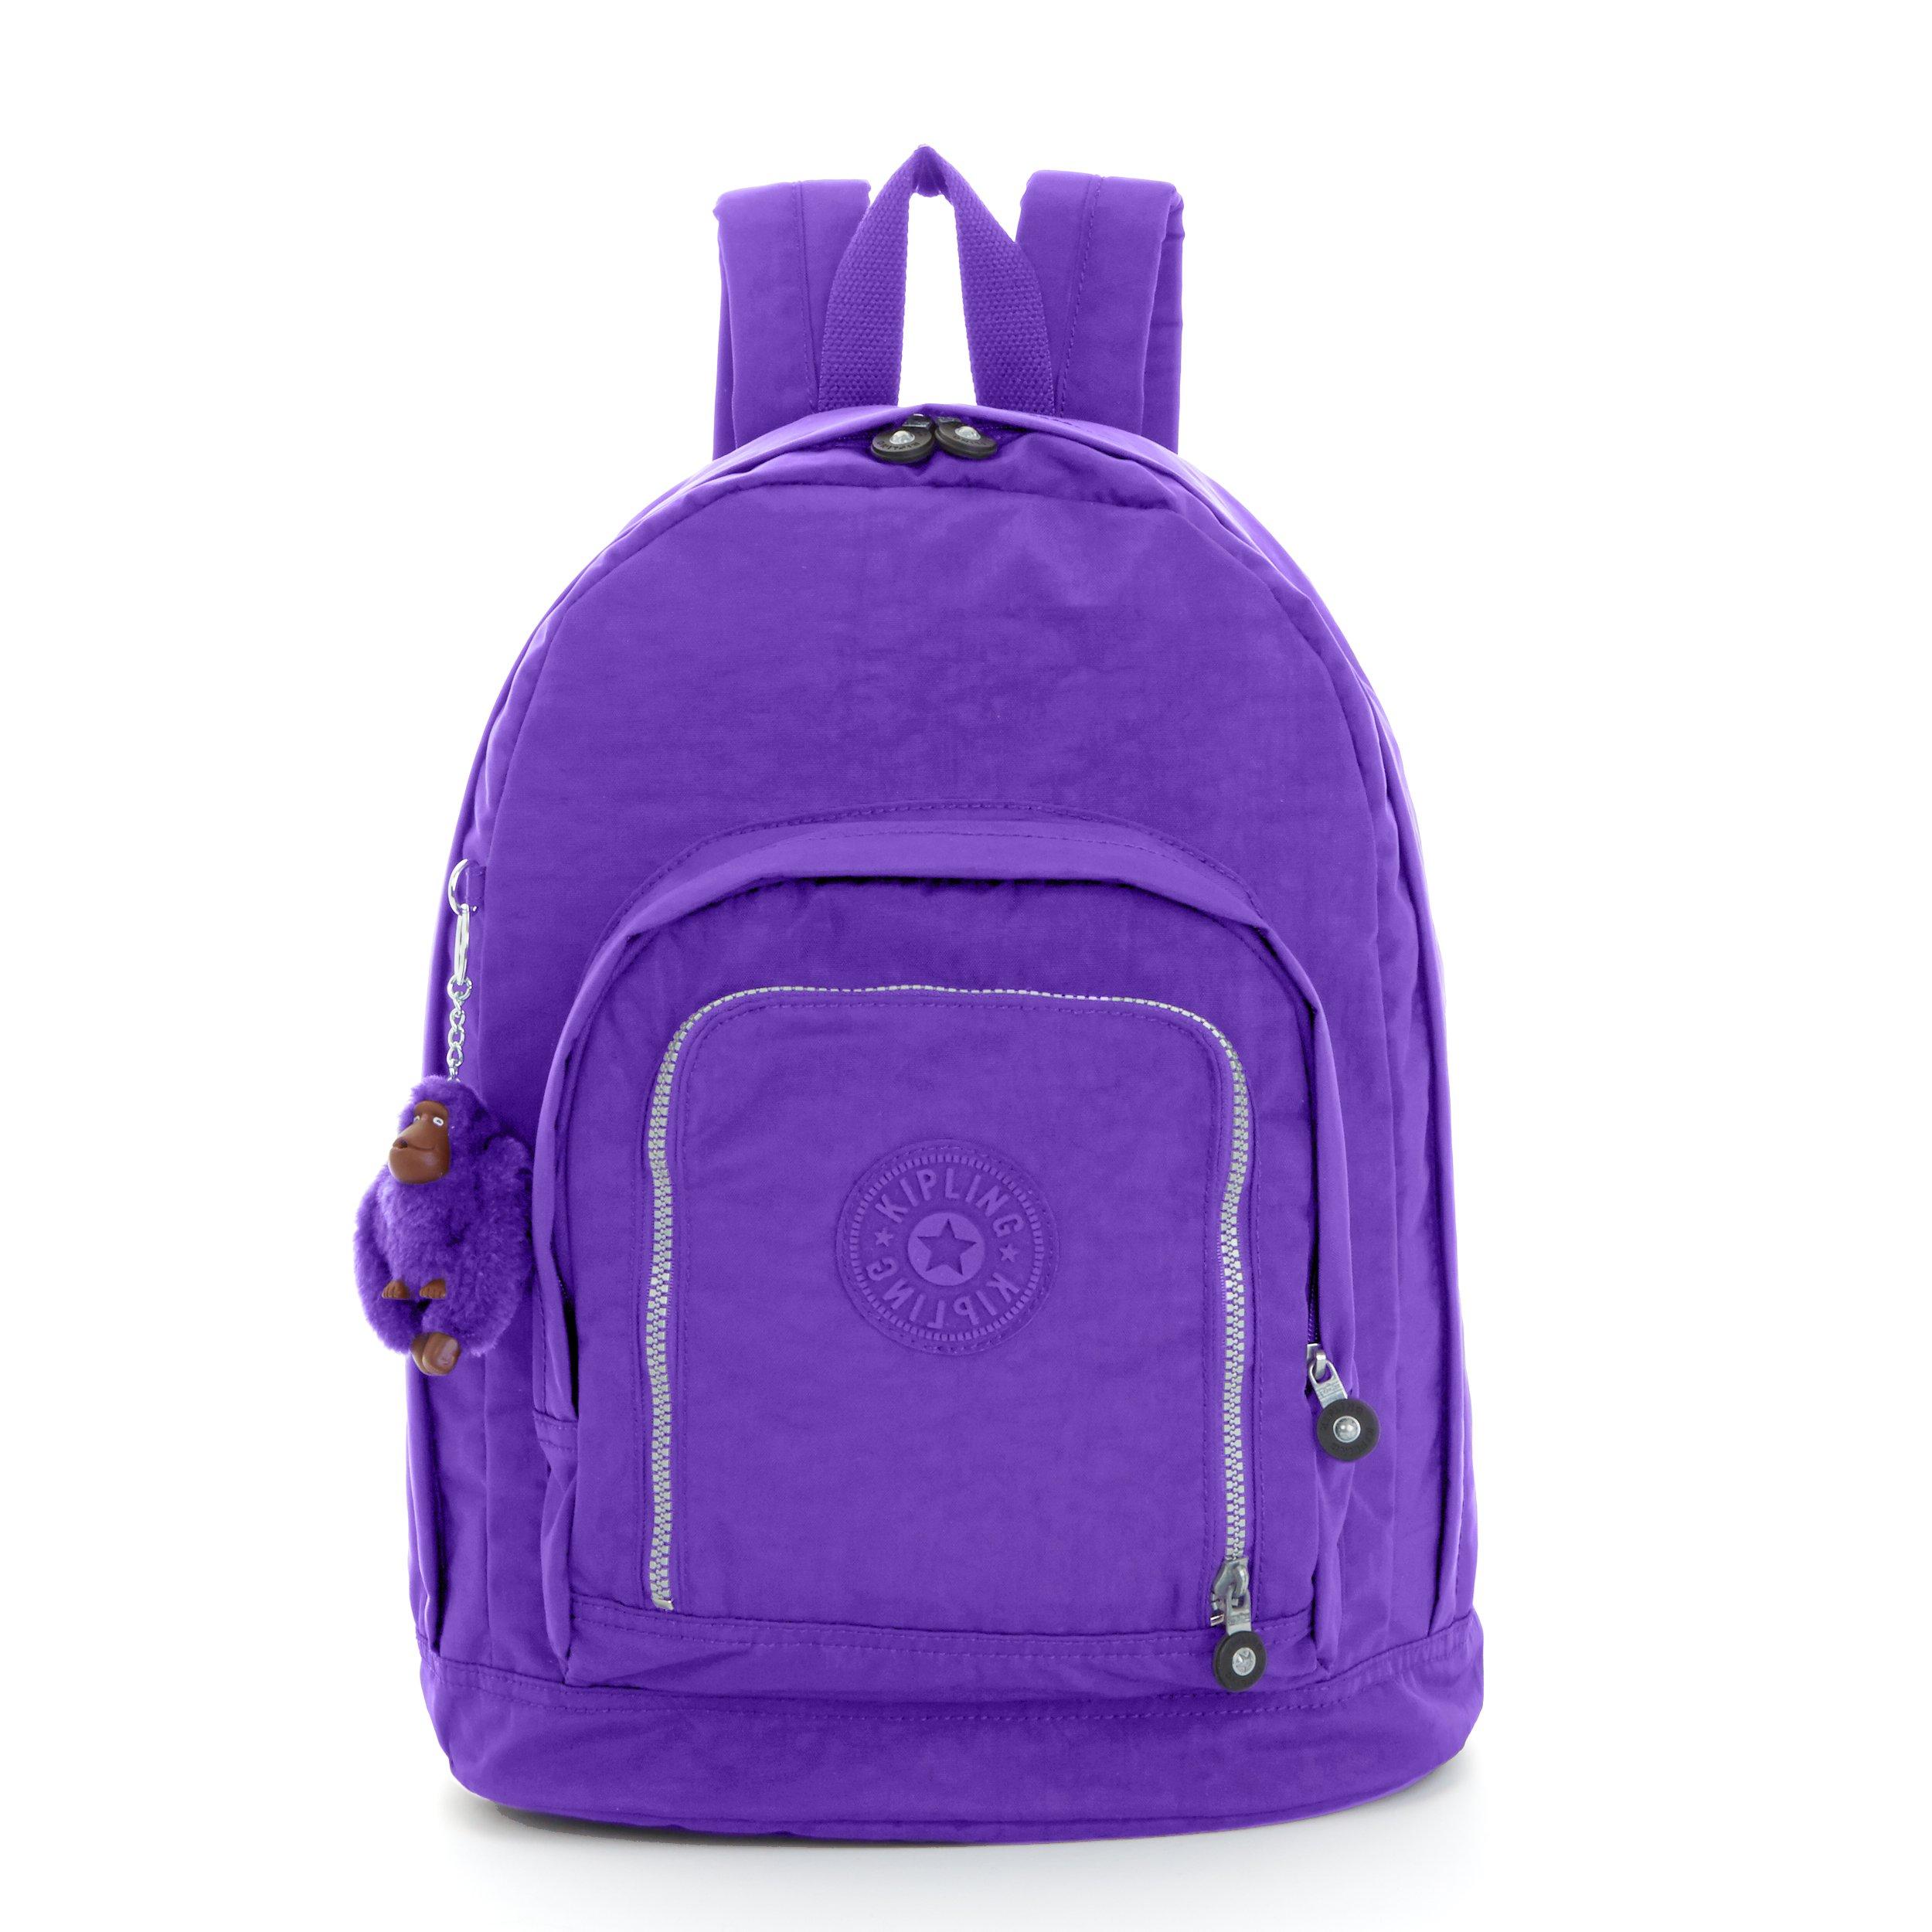 Kipling Trent bag, Octopus Purple, One Size